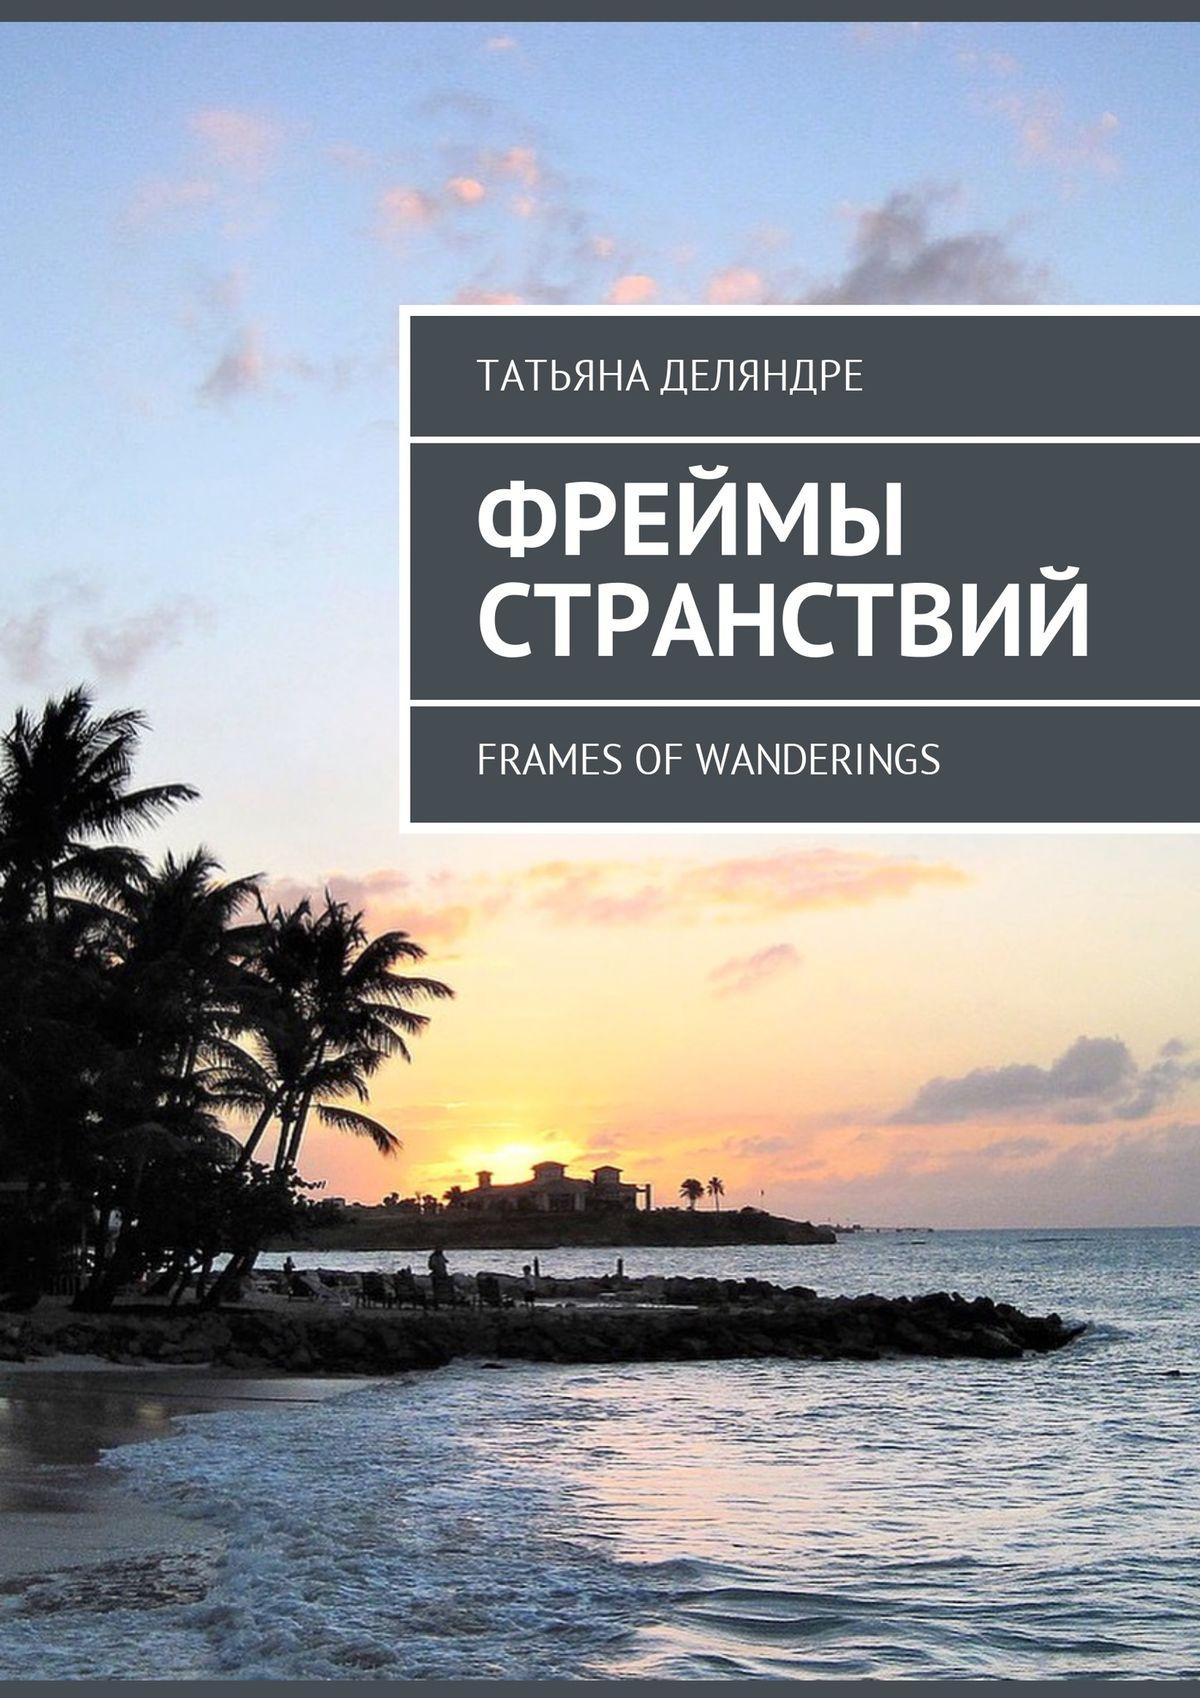 Татьяна Деляндре Фреймы странствий. Frames ofwanderings